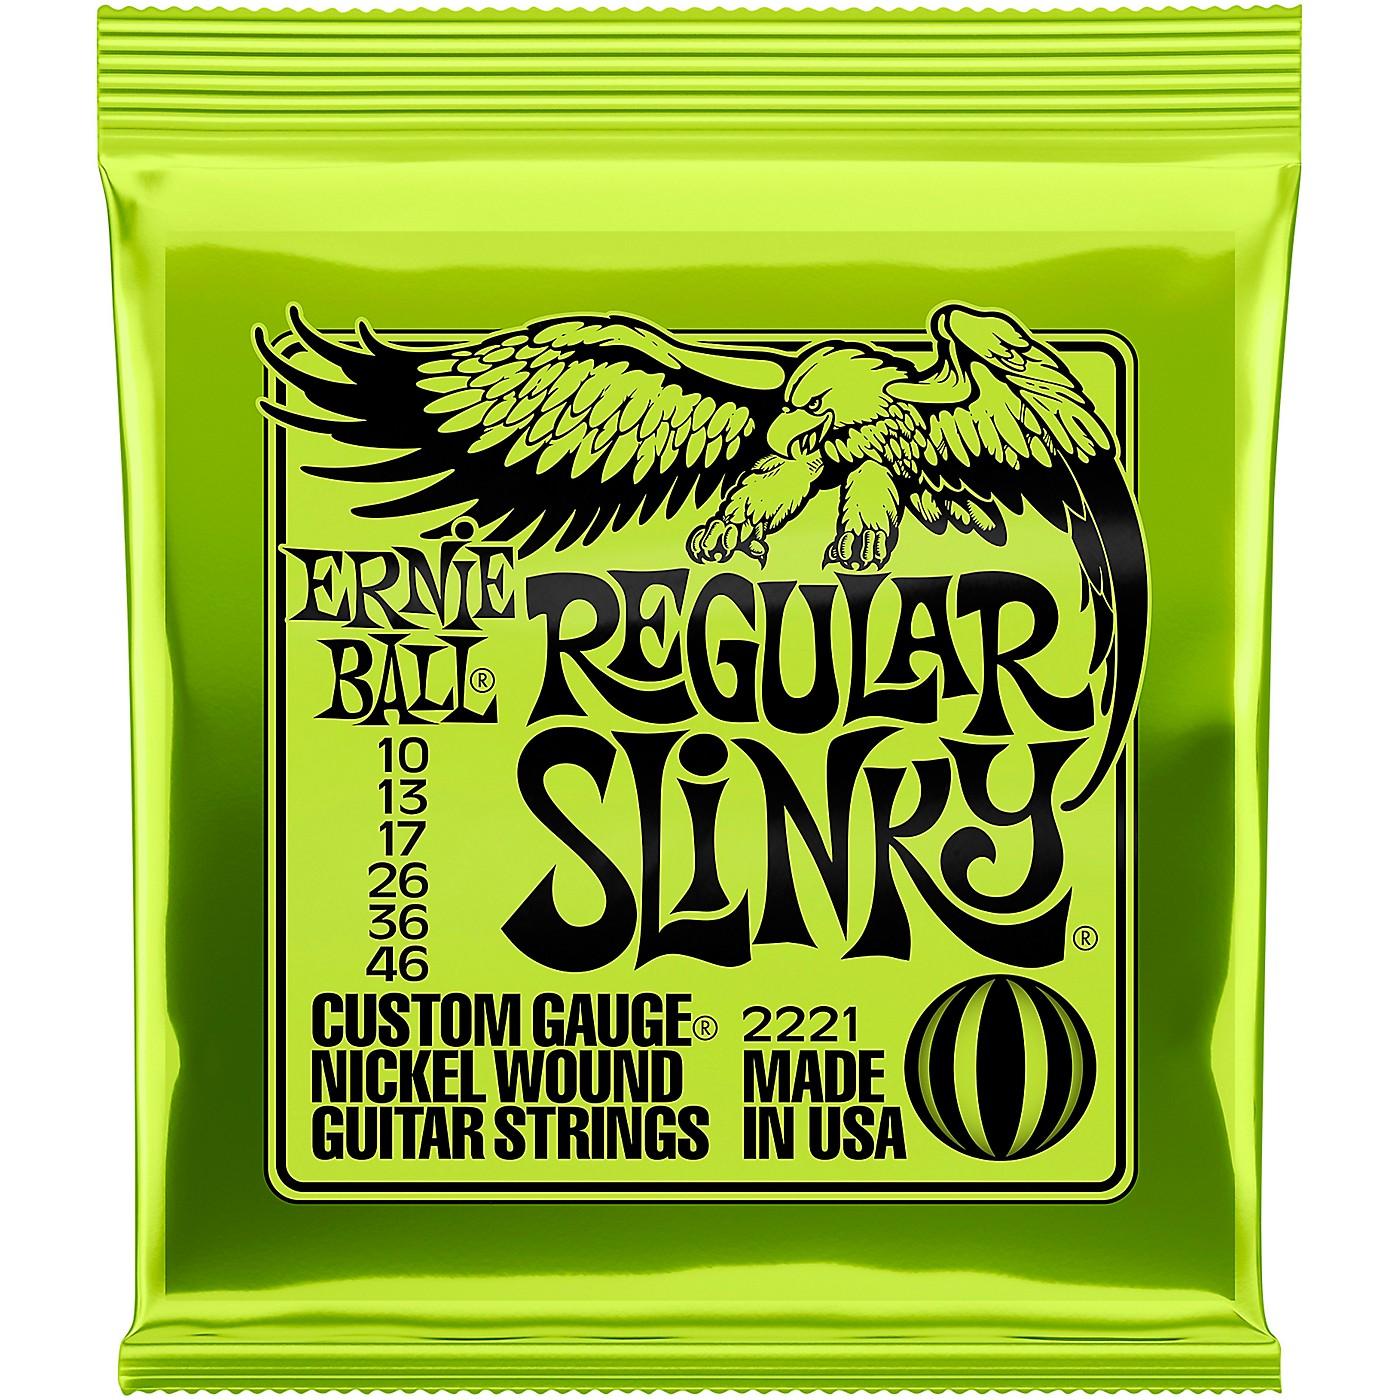 Ernie Ball Regular Slinky 2221 (10-46) Nickel Wound Electric Guitar Strings thumbnail